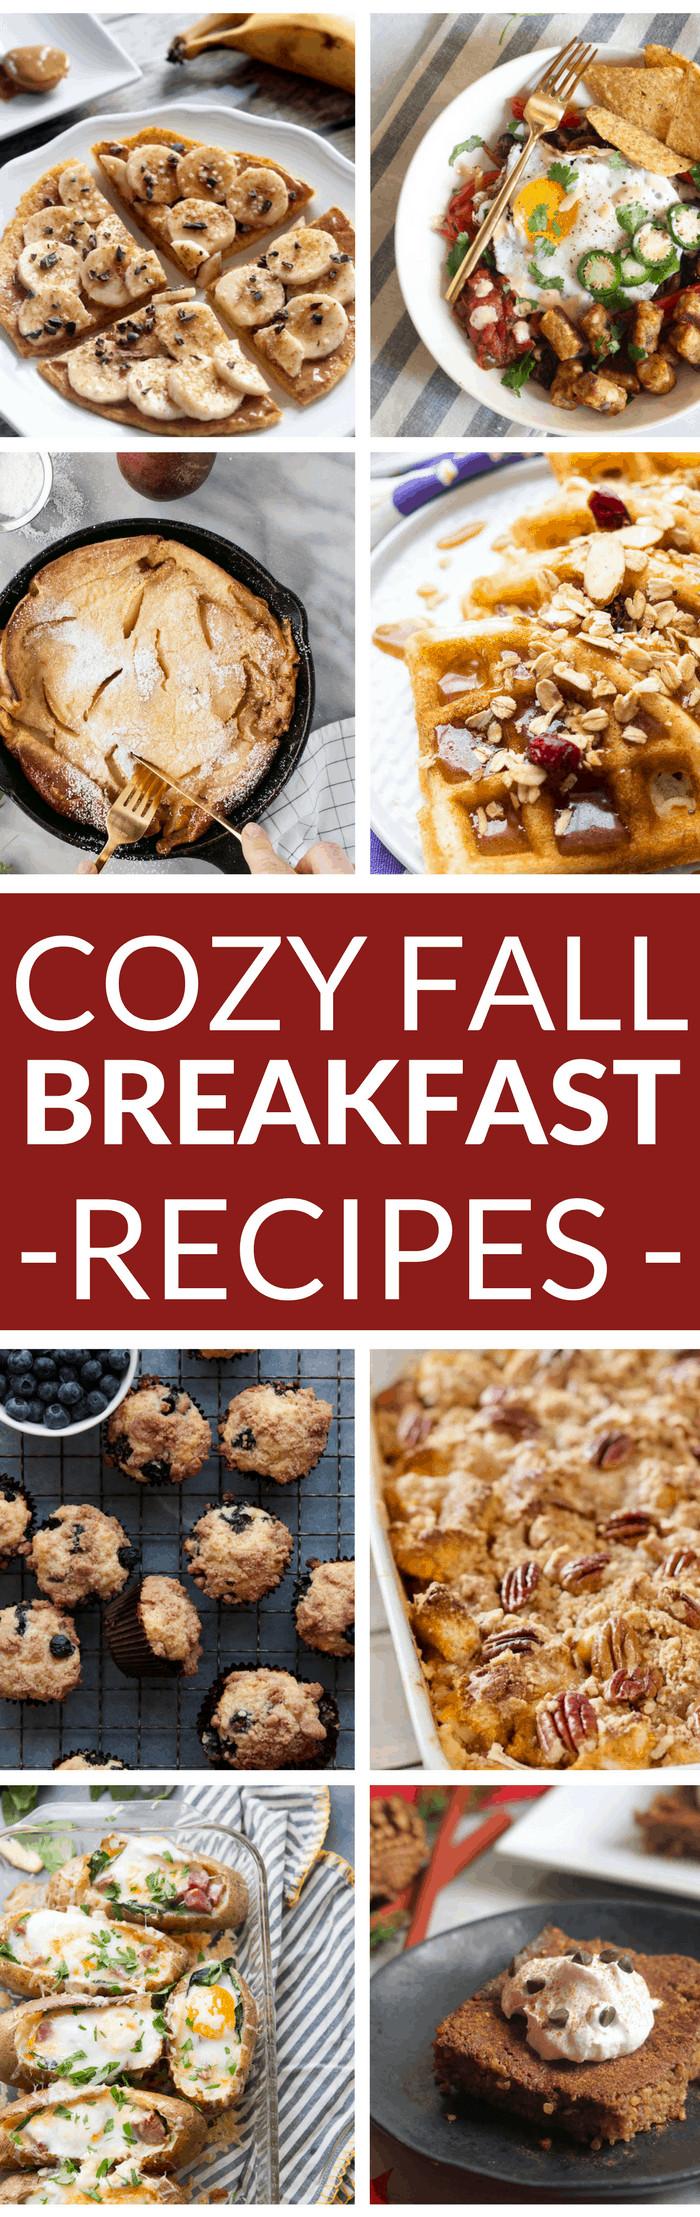 Healthy Fall Breakfast Recipes  25 Cozy Fall Breakfast Recipes Hummusapien